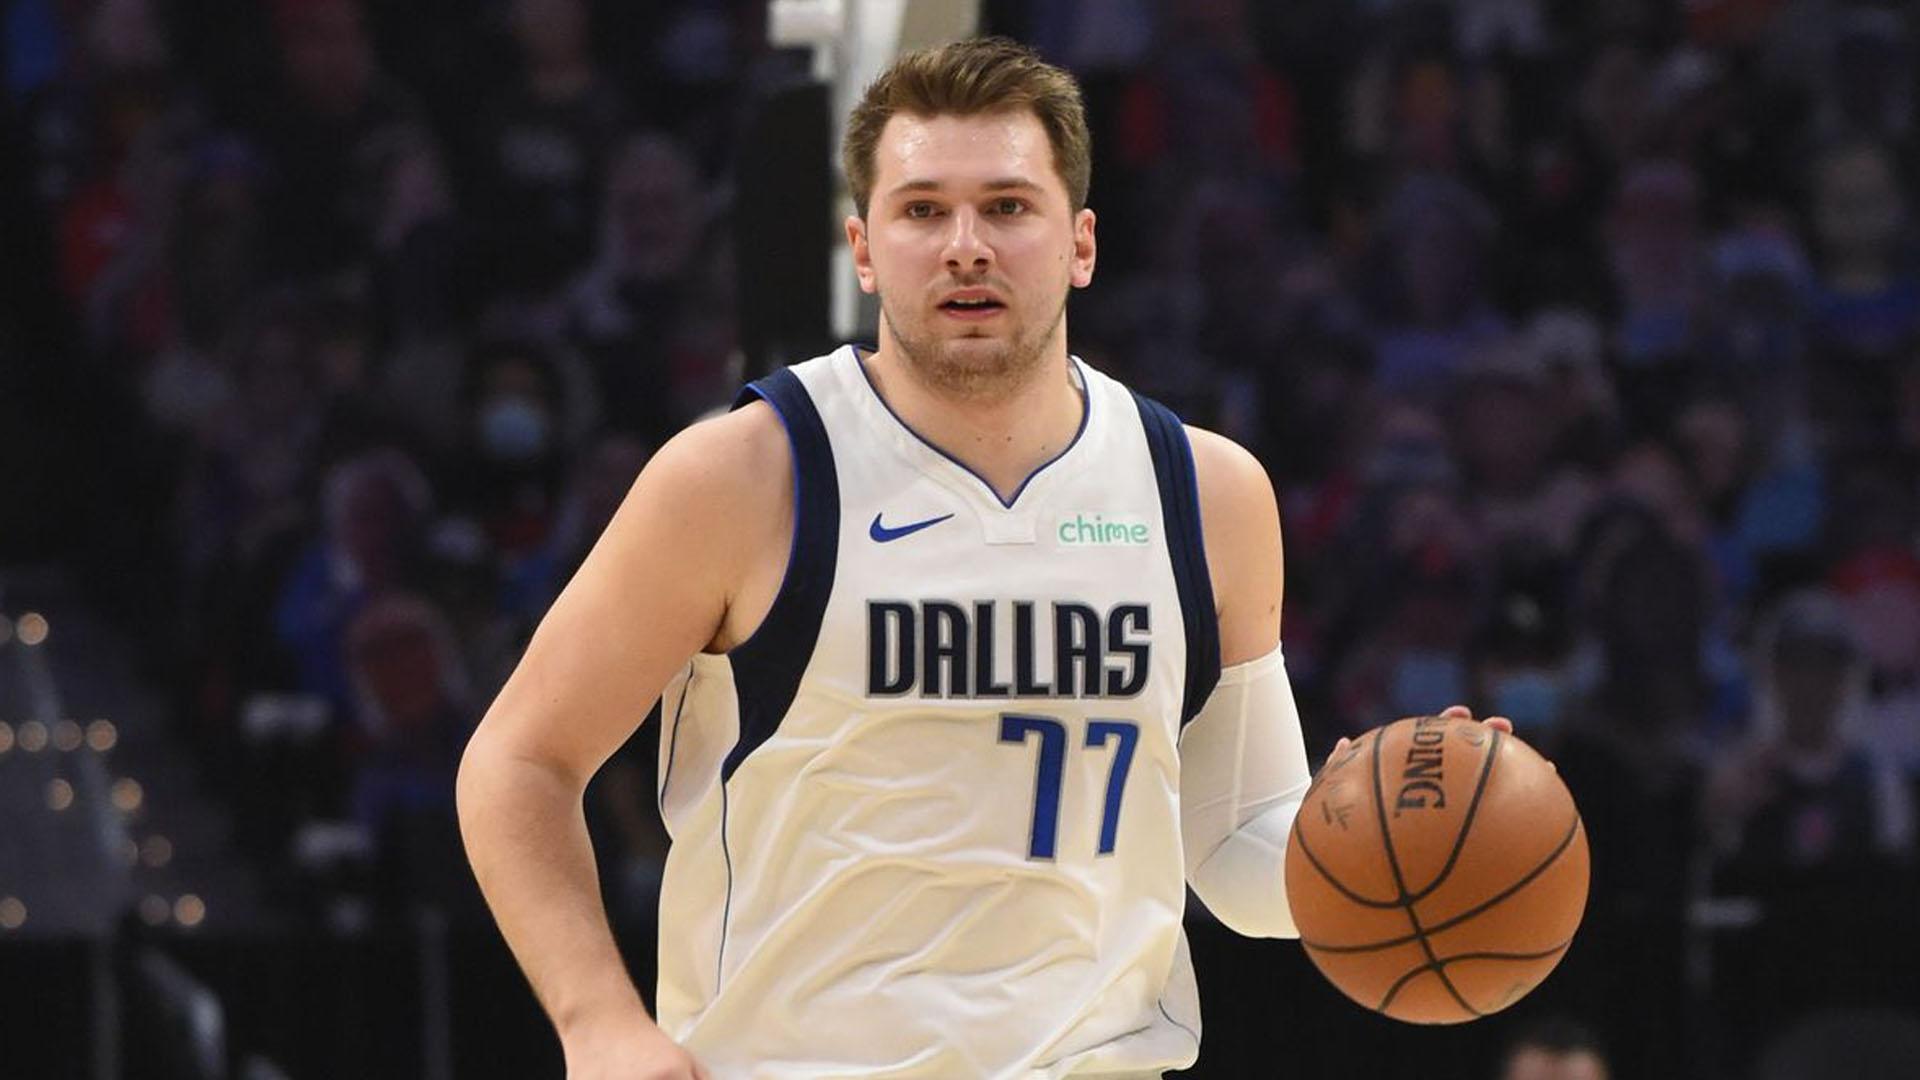 NBA Doncic Dallas rinnovo